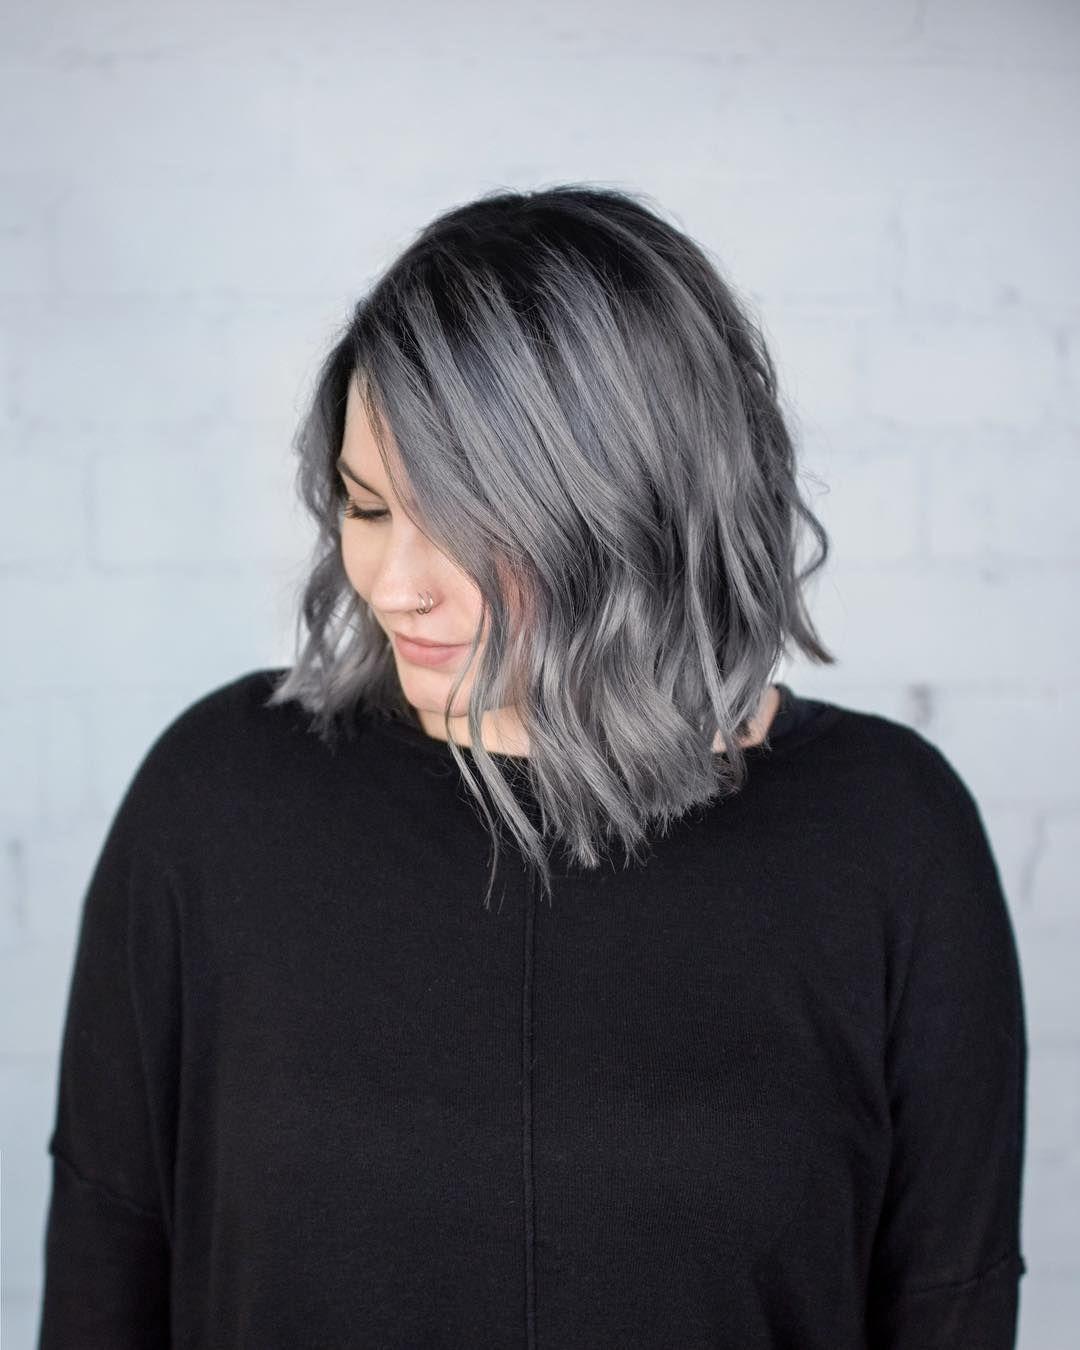 Steel Grey Aveda Hair Color By Aveda Artist Mallory Dejong